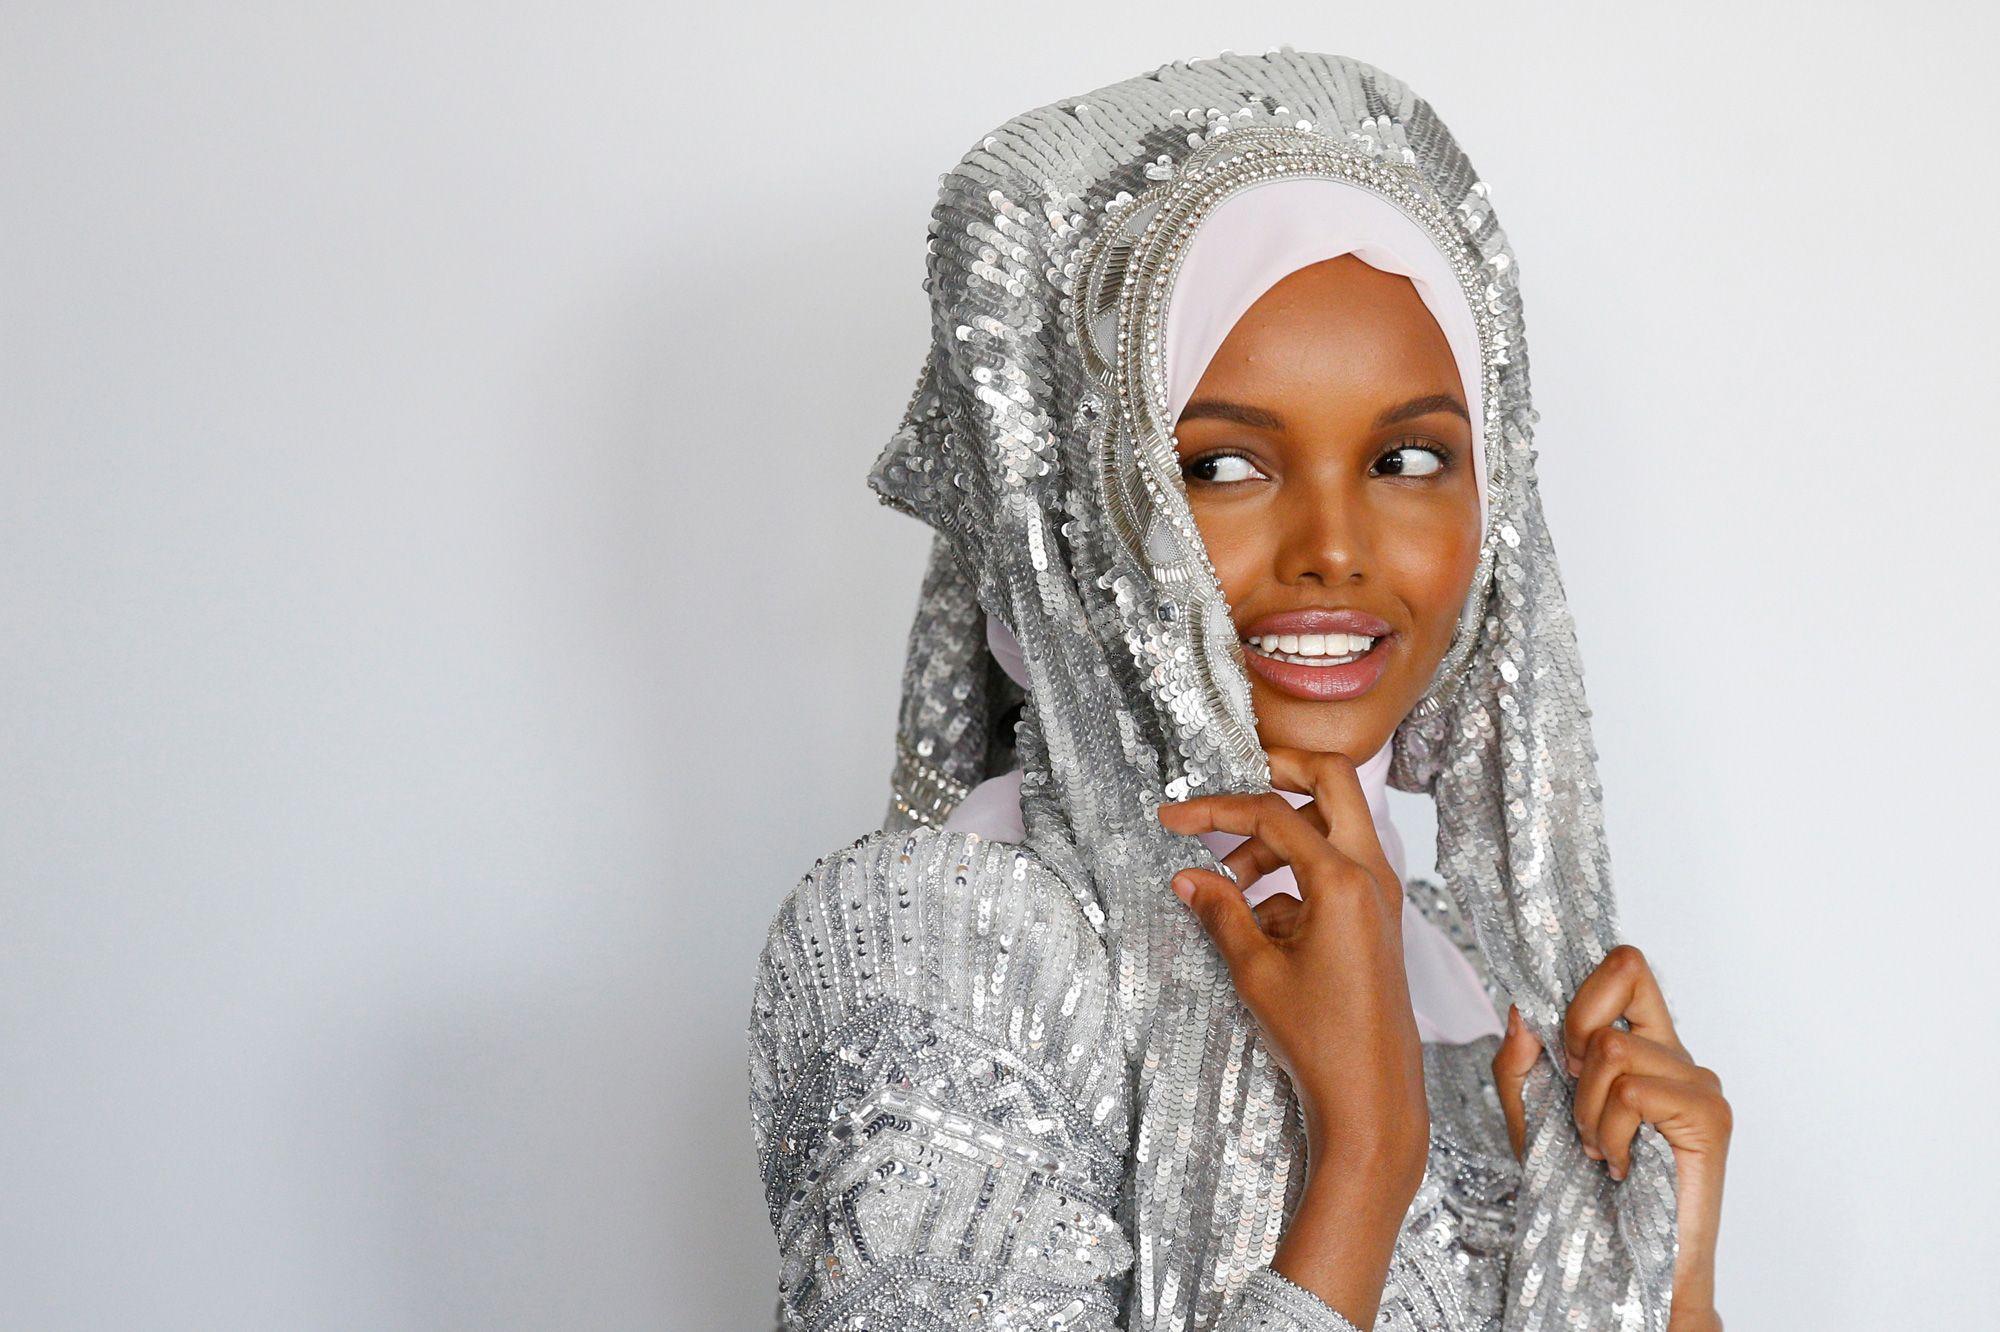 Des Princesse Aden19 AnsMusulmaneEt Halima Podiums gYb7yvf6